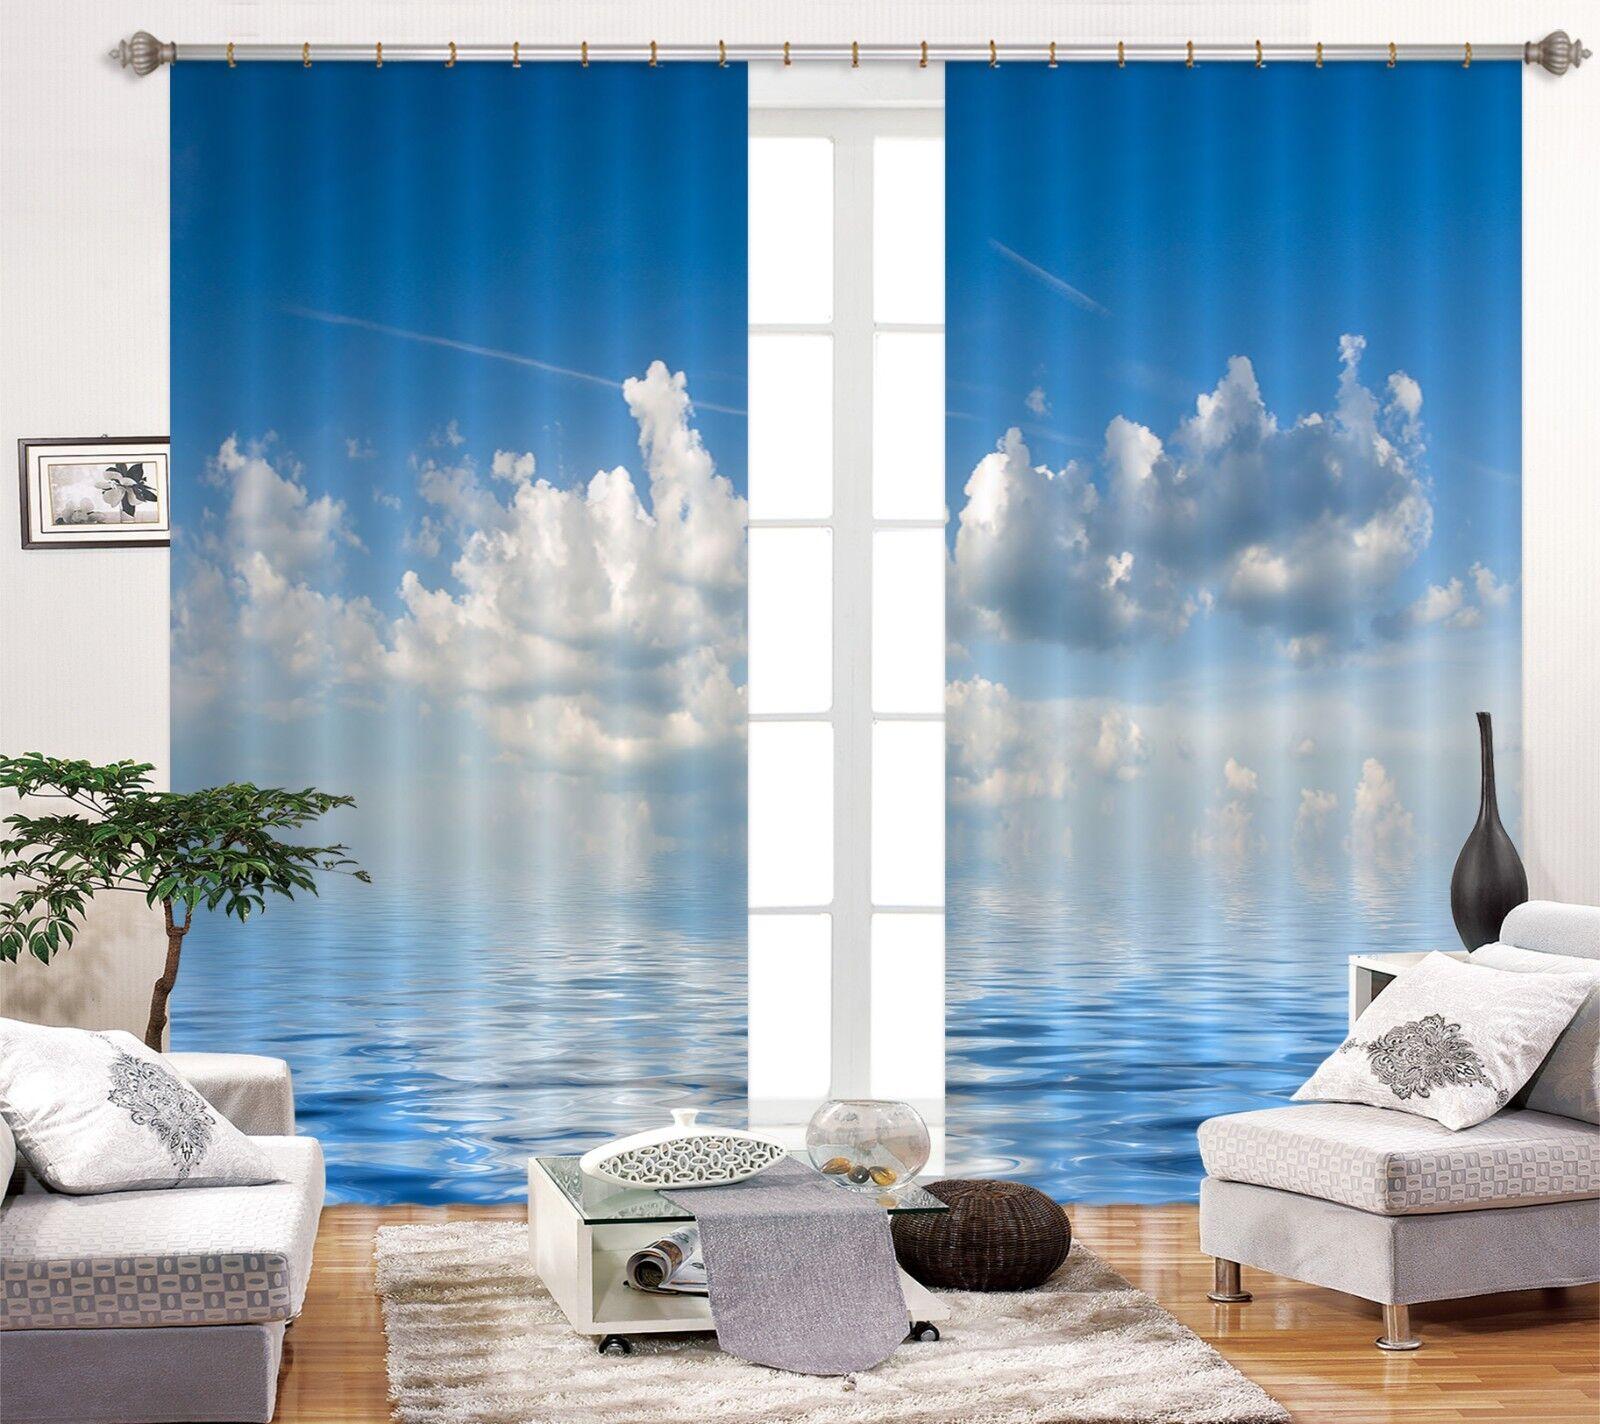 3D mar nubes 2 Cortinas de impresión de cortina de foto Blockout Tela Cortinas Ventana au